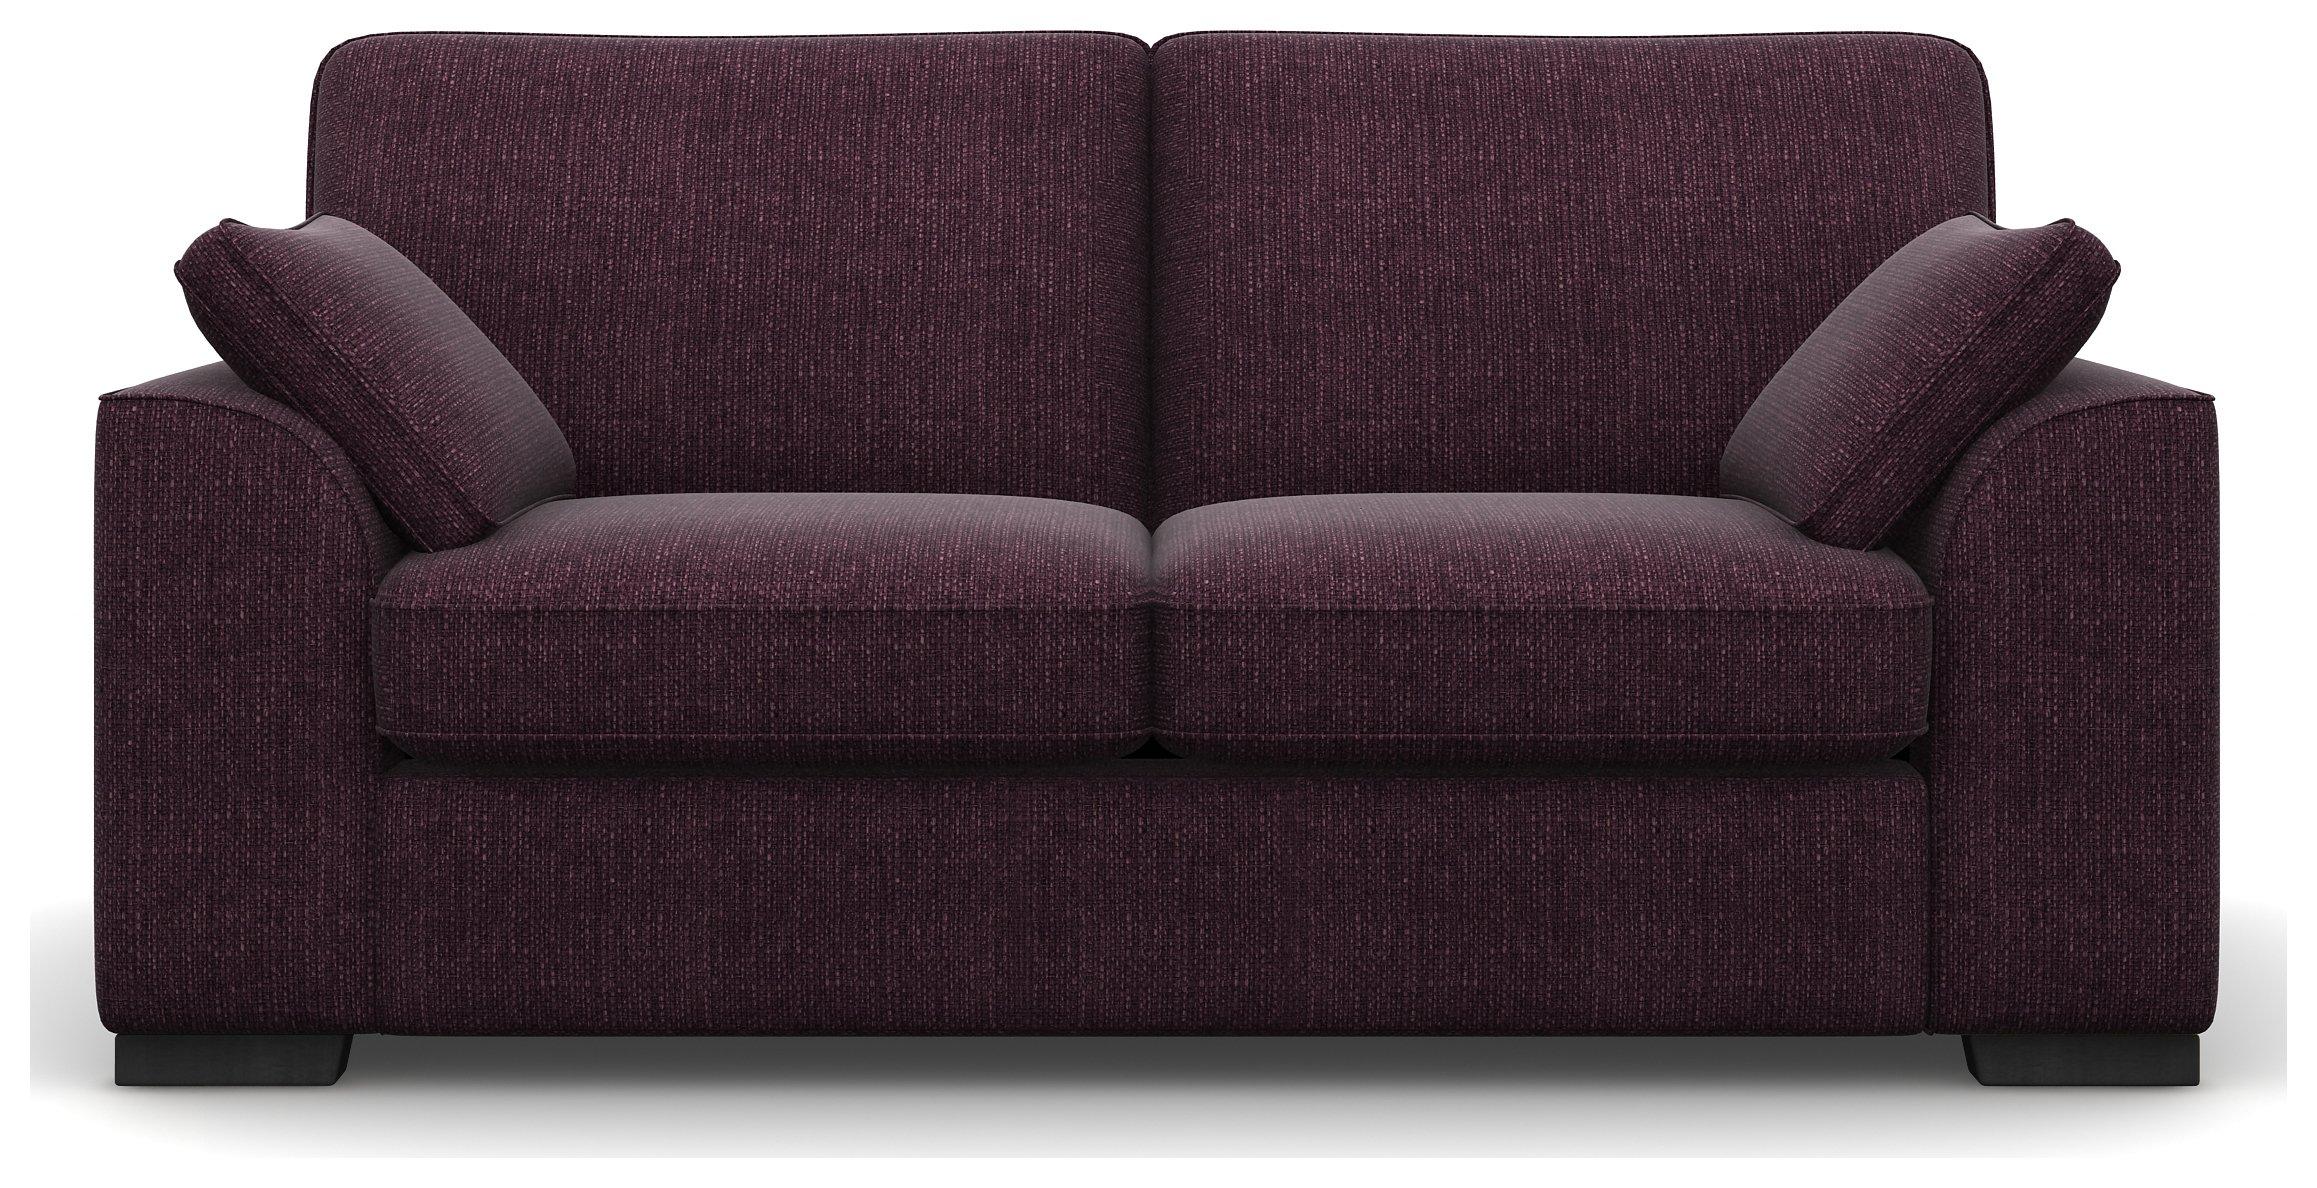 Heart of House Lincoln 2 Seater Fabric Sofa - Purple + Black Legs